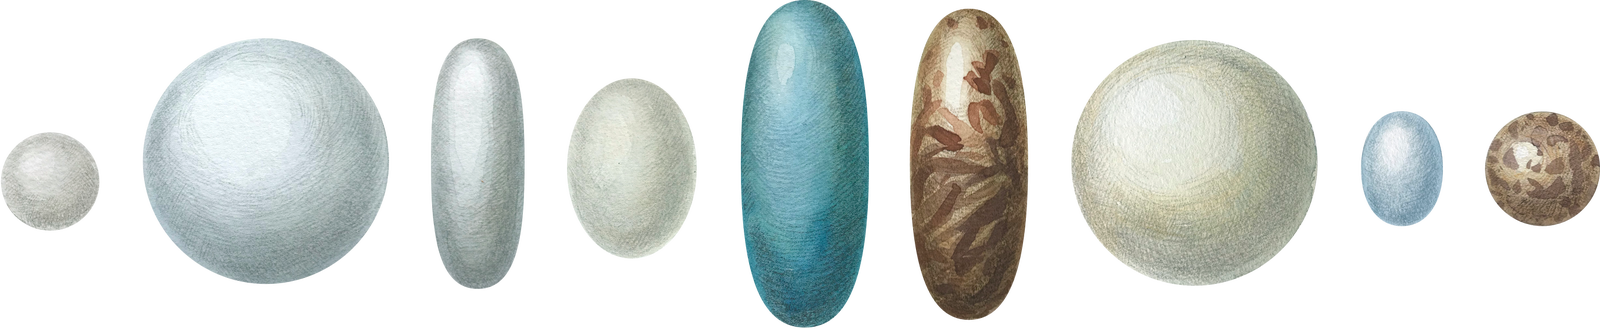 Цвет скорлупы яиц